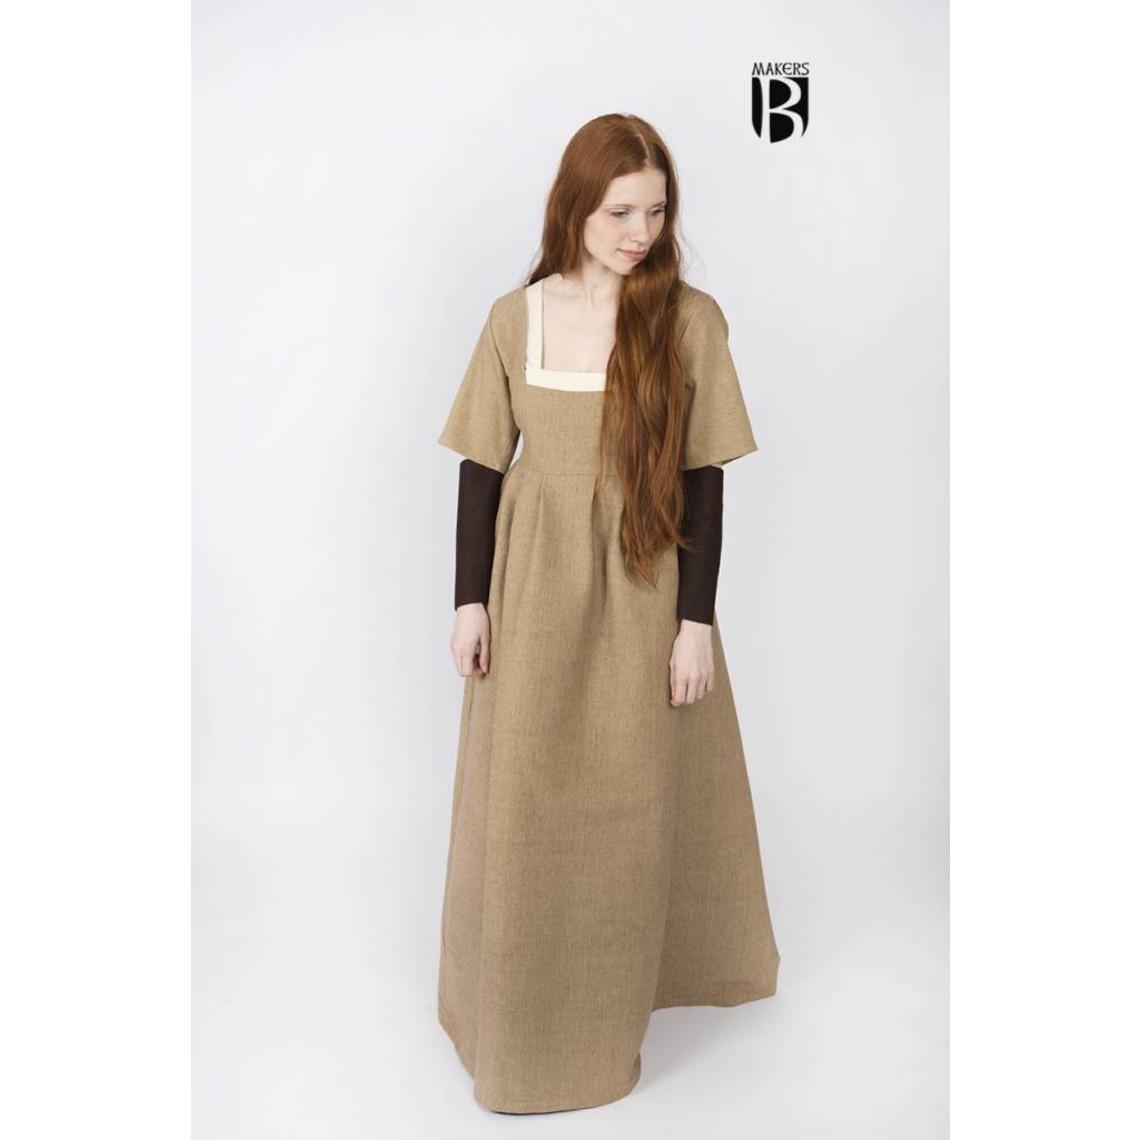 Burgschneider Mangas Vestido mediano Frideswinde marrón